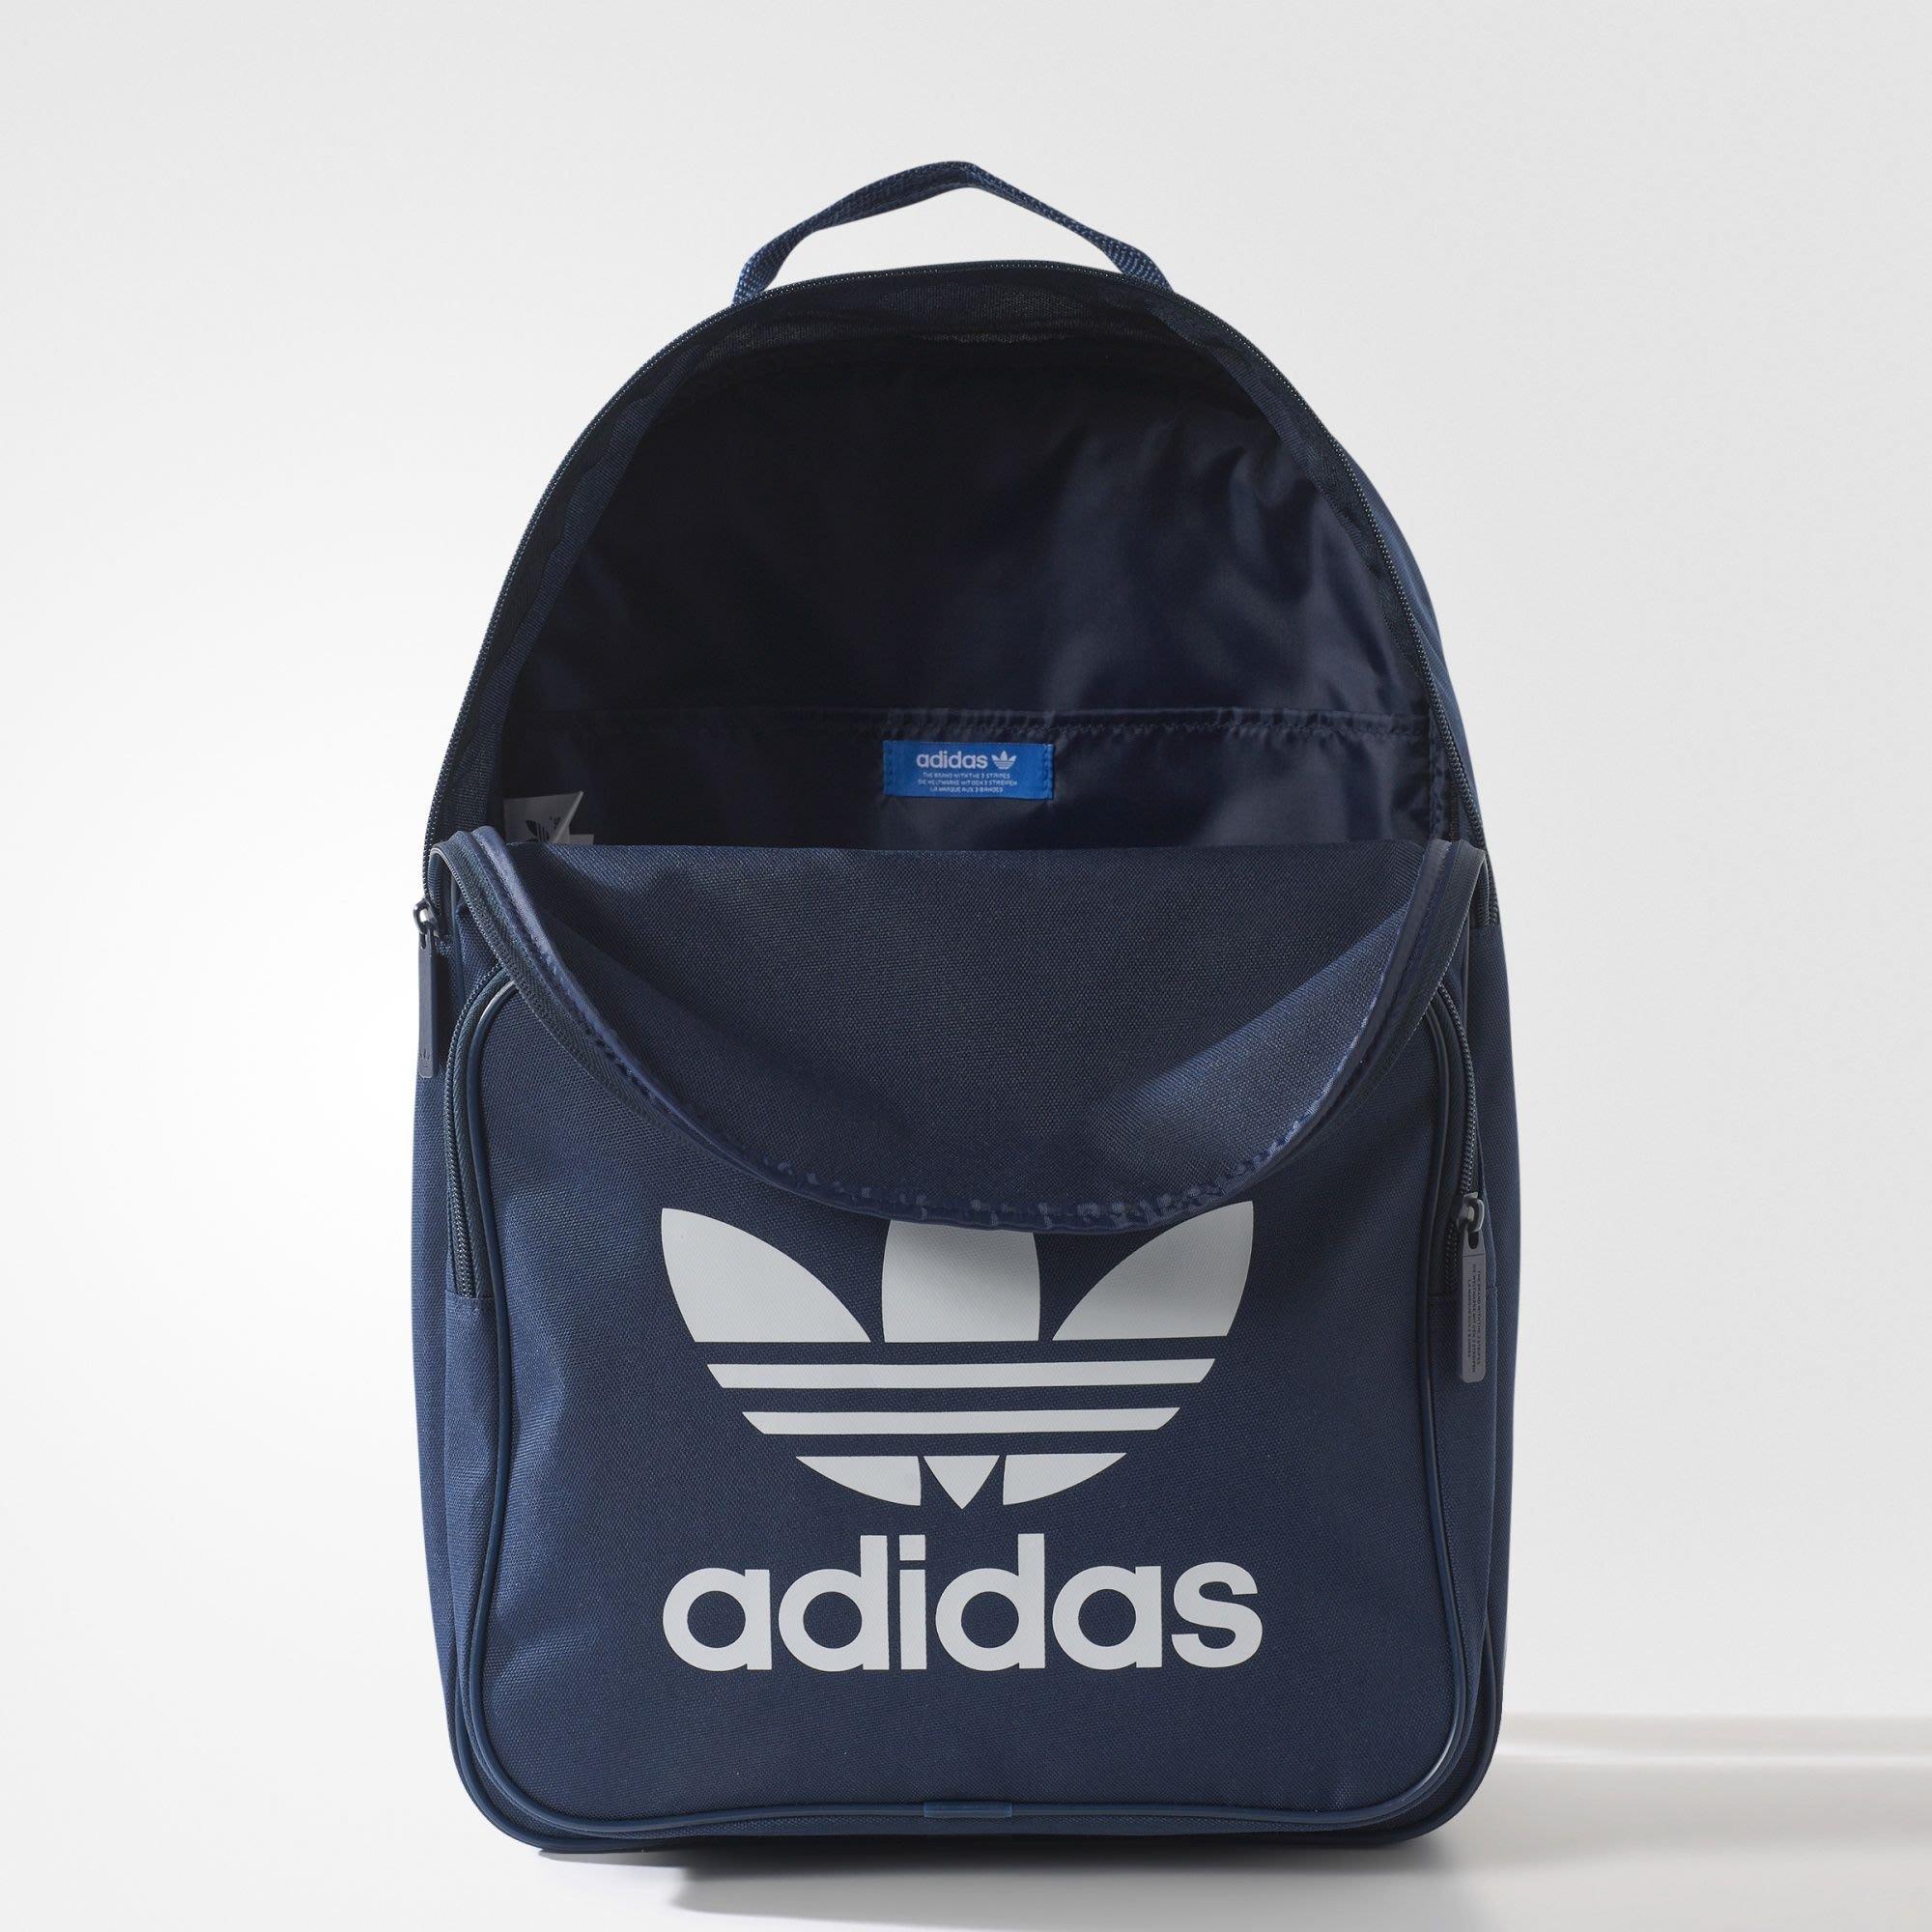 31be458aeab2 正品現貨Adidas Originals TREFOIL BACKPACK 愛迪達三葉草深藍後背包筆電 ...